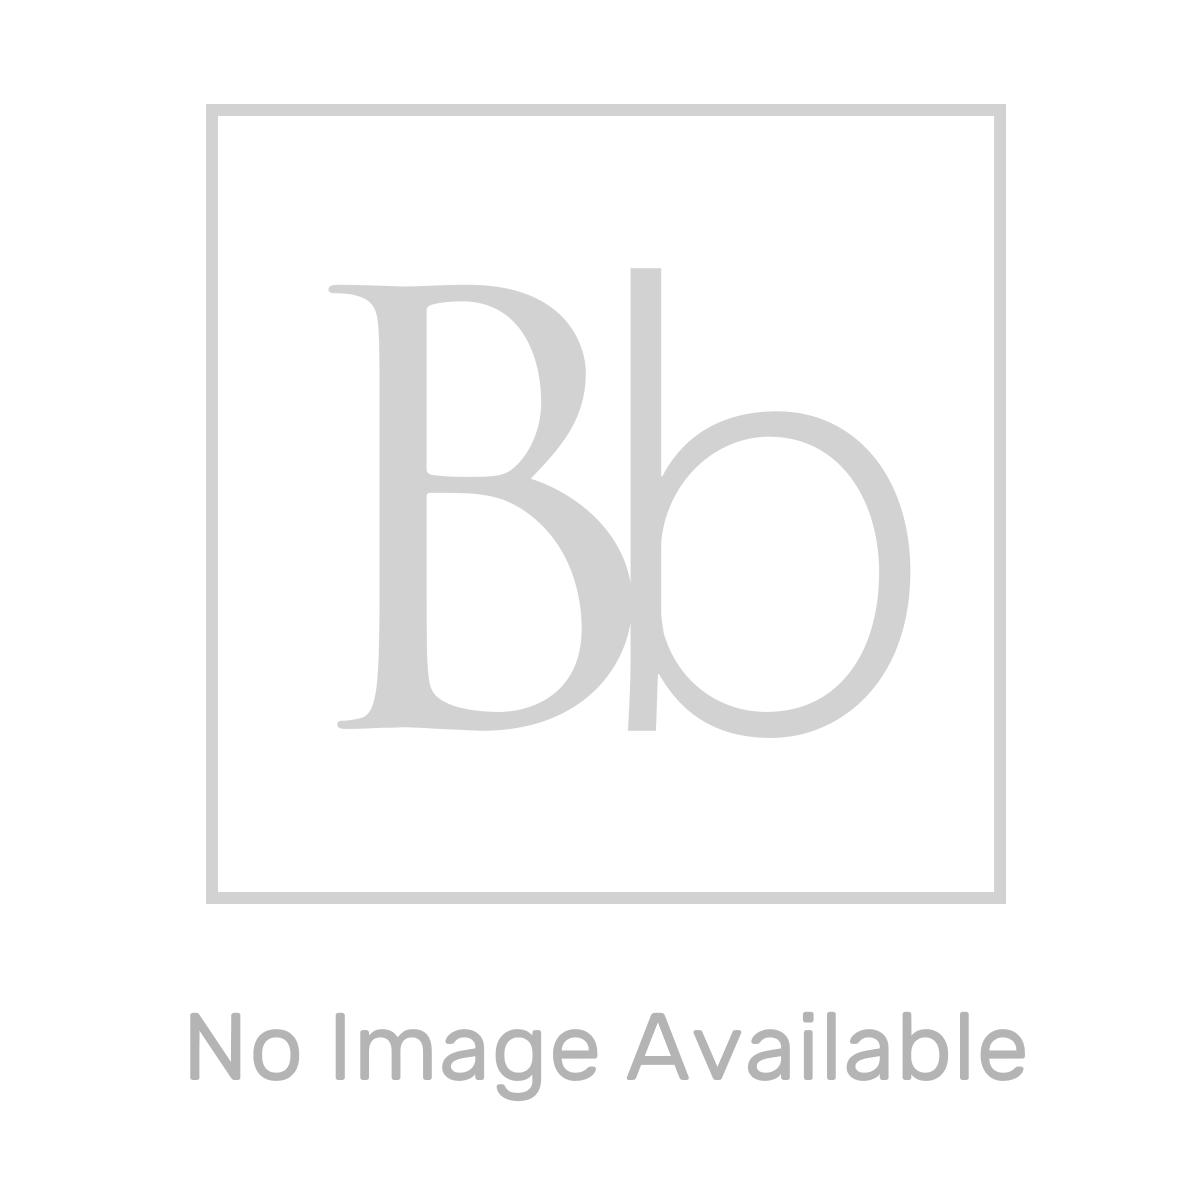 Sensio Ainsley Triple Diffused LED Mirrored Cabinet Internal